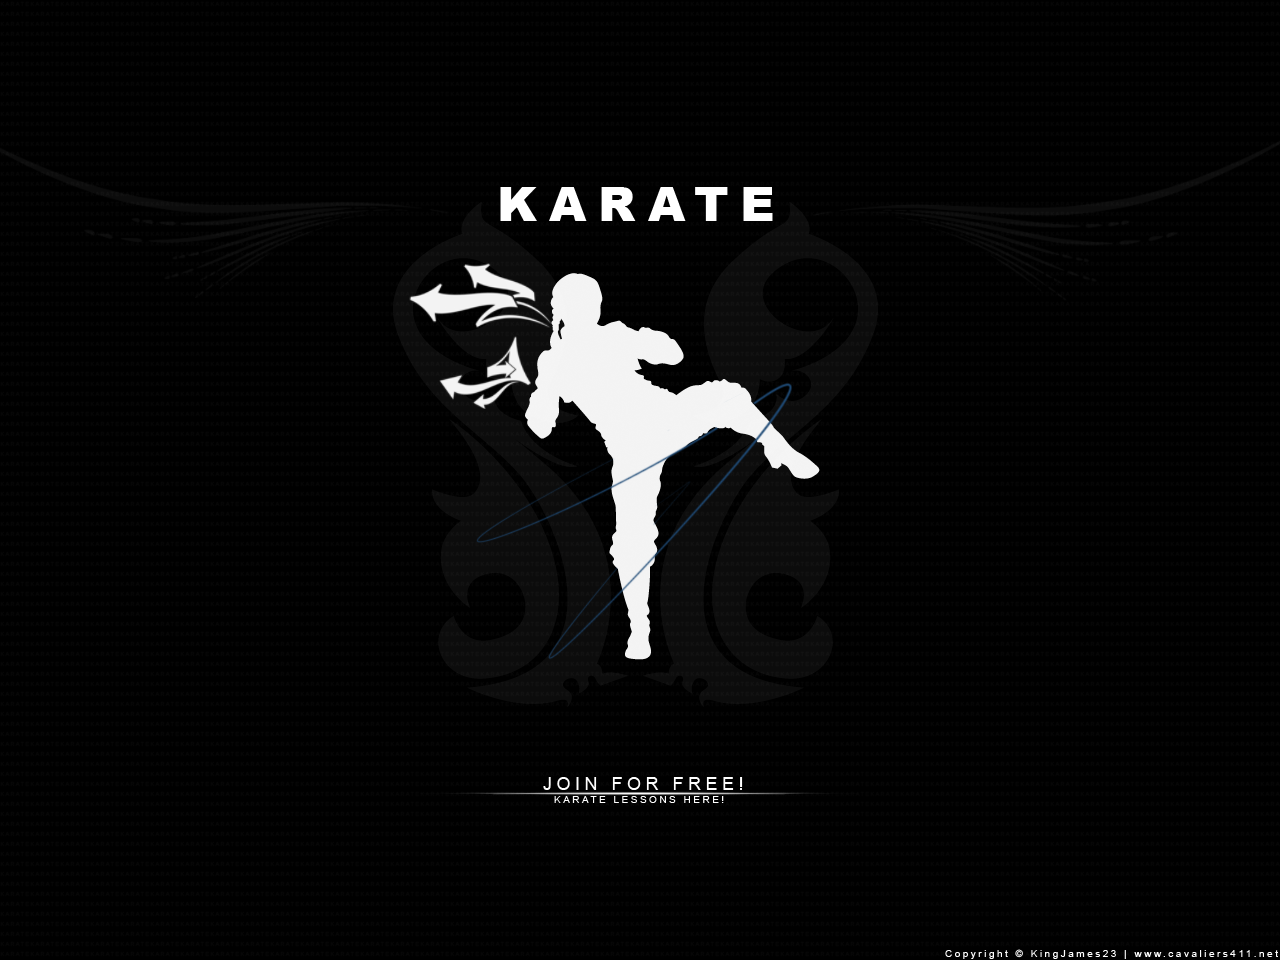 kenpo karate Page 6 1280x960